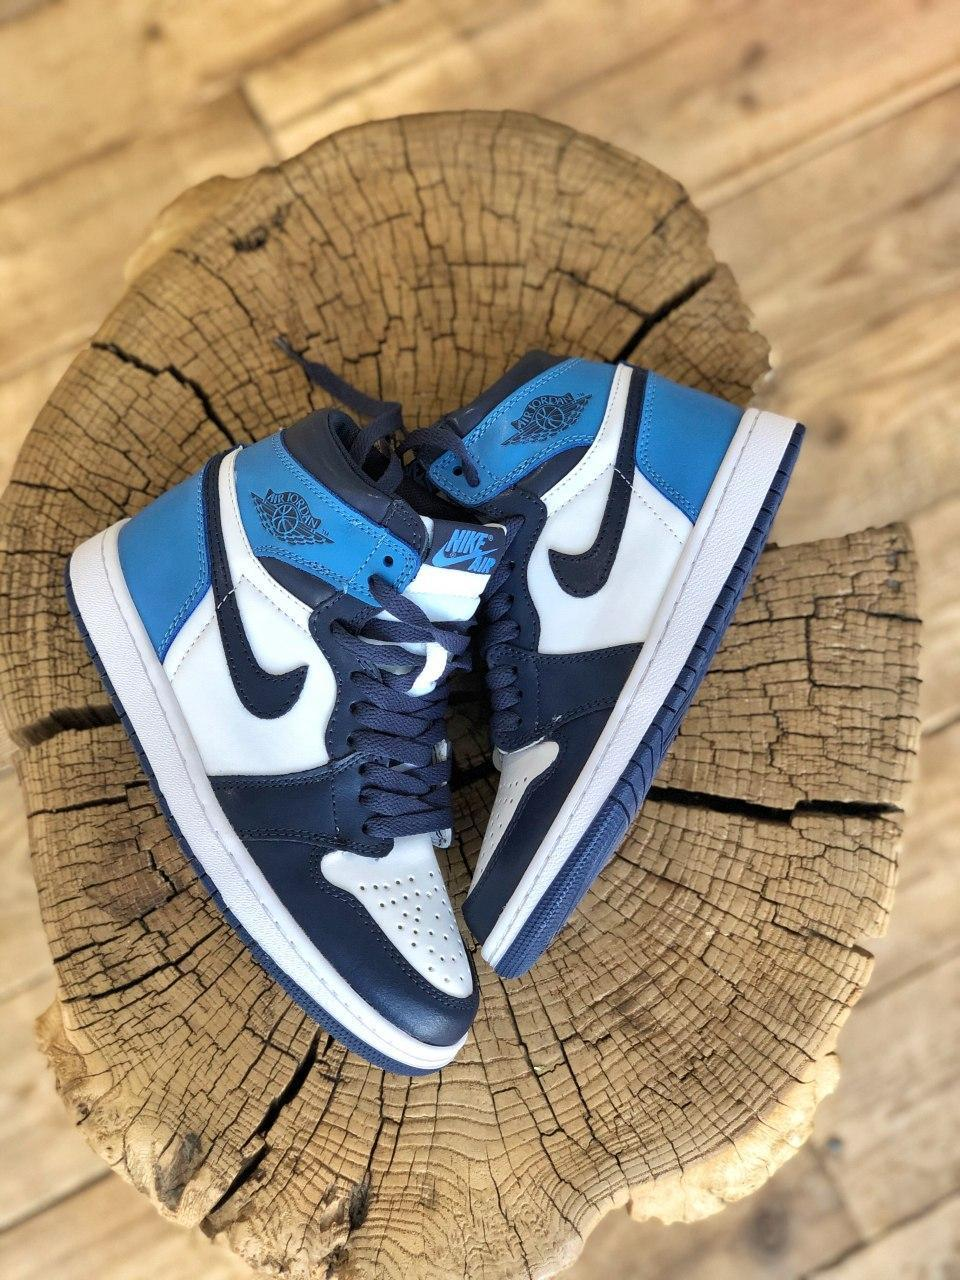 Кроссовки мужские Nike Air Jordan в стиле найк джордан Синие (Реплика ААА+)